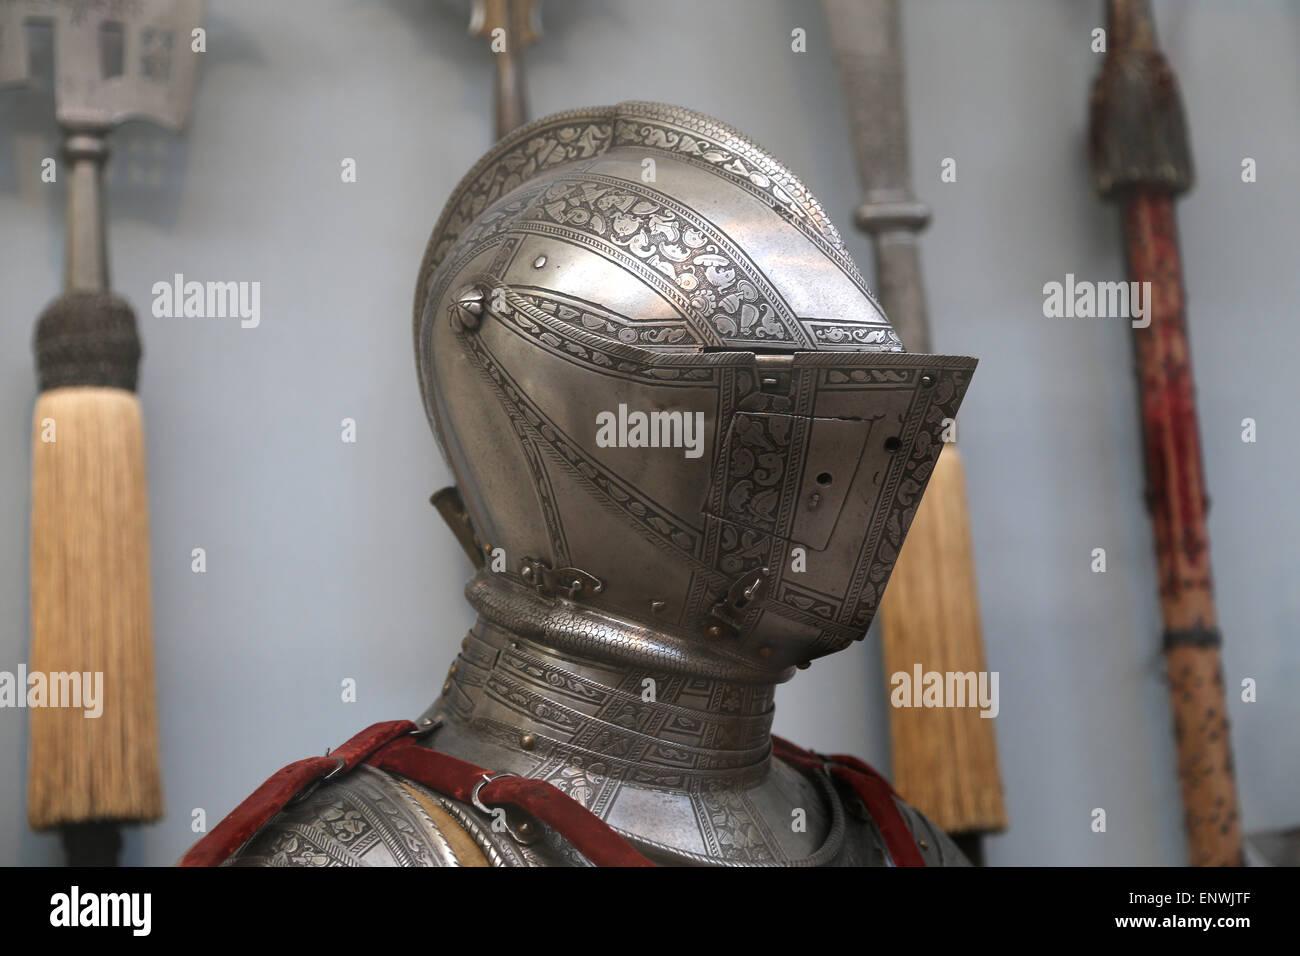 Rüstung. Neuzeit. Europa. 16. Jahrhundert. Detail. Helm. Metropolitan Museum of Art. New York. USA. Stockbild